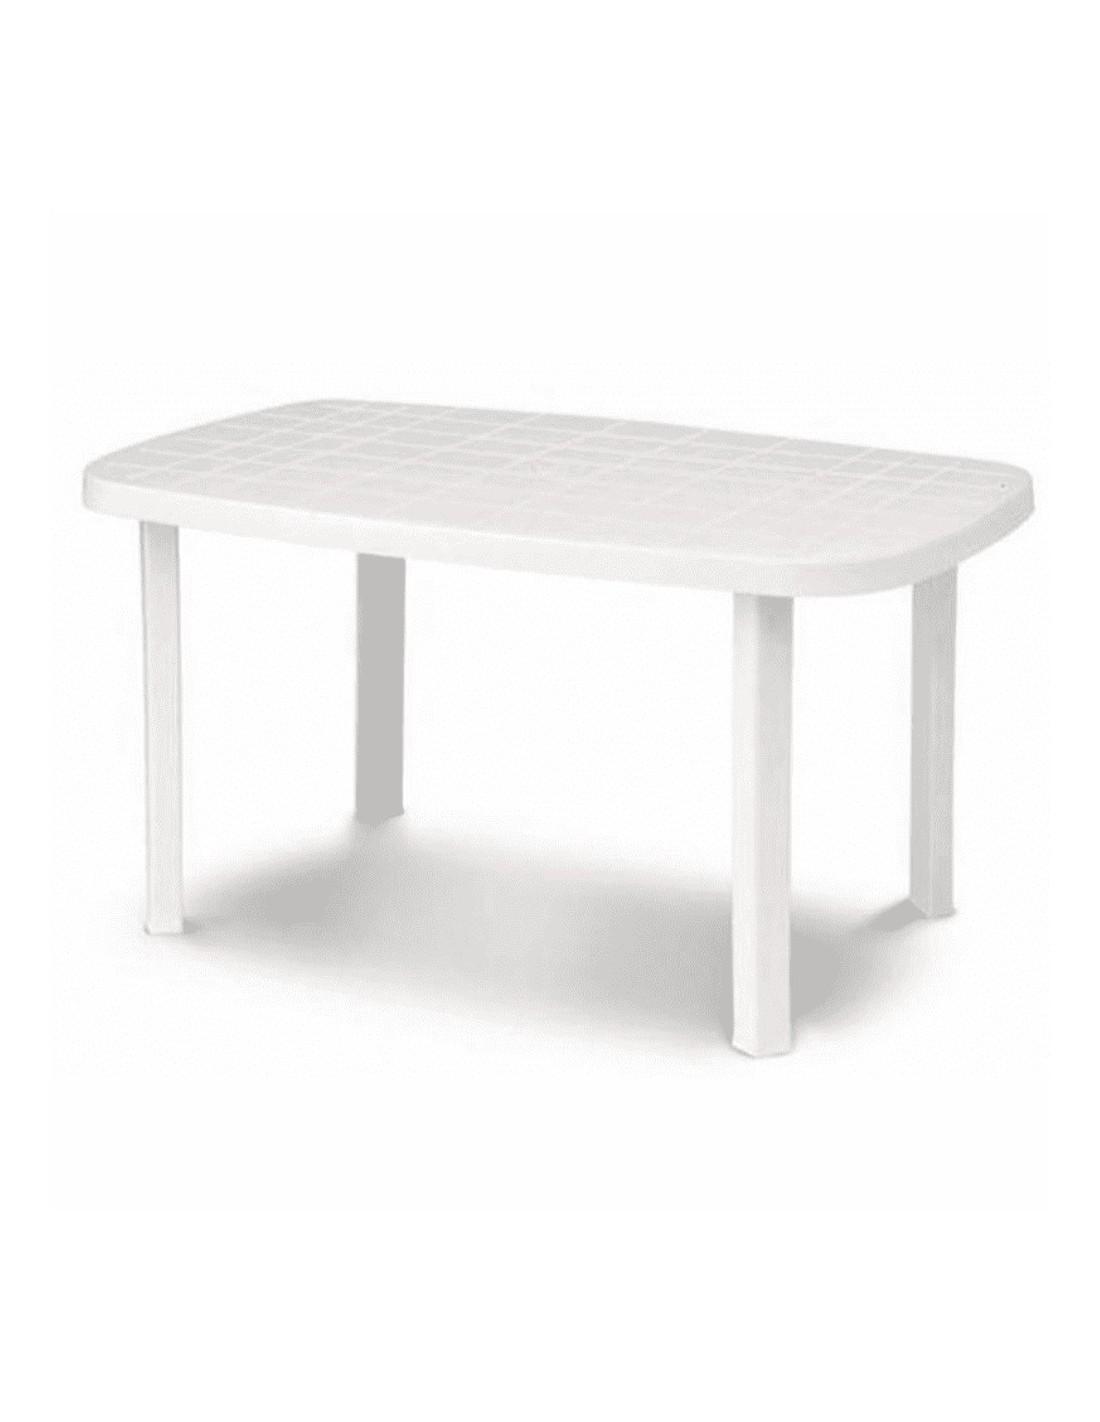 Tavolo da giardino in resina ovale bianco Otello 136 x 82 x 72 centimetri